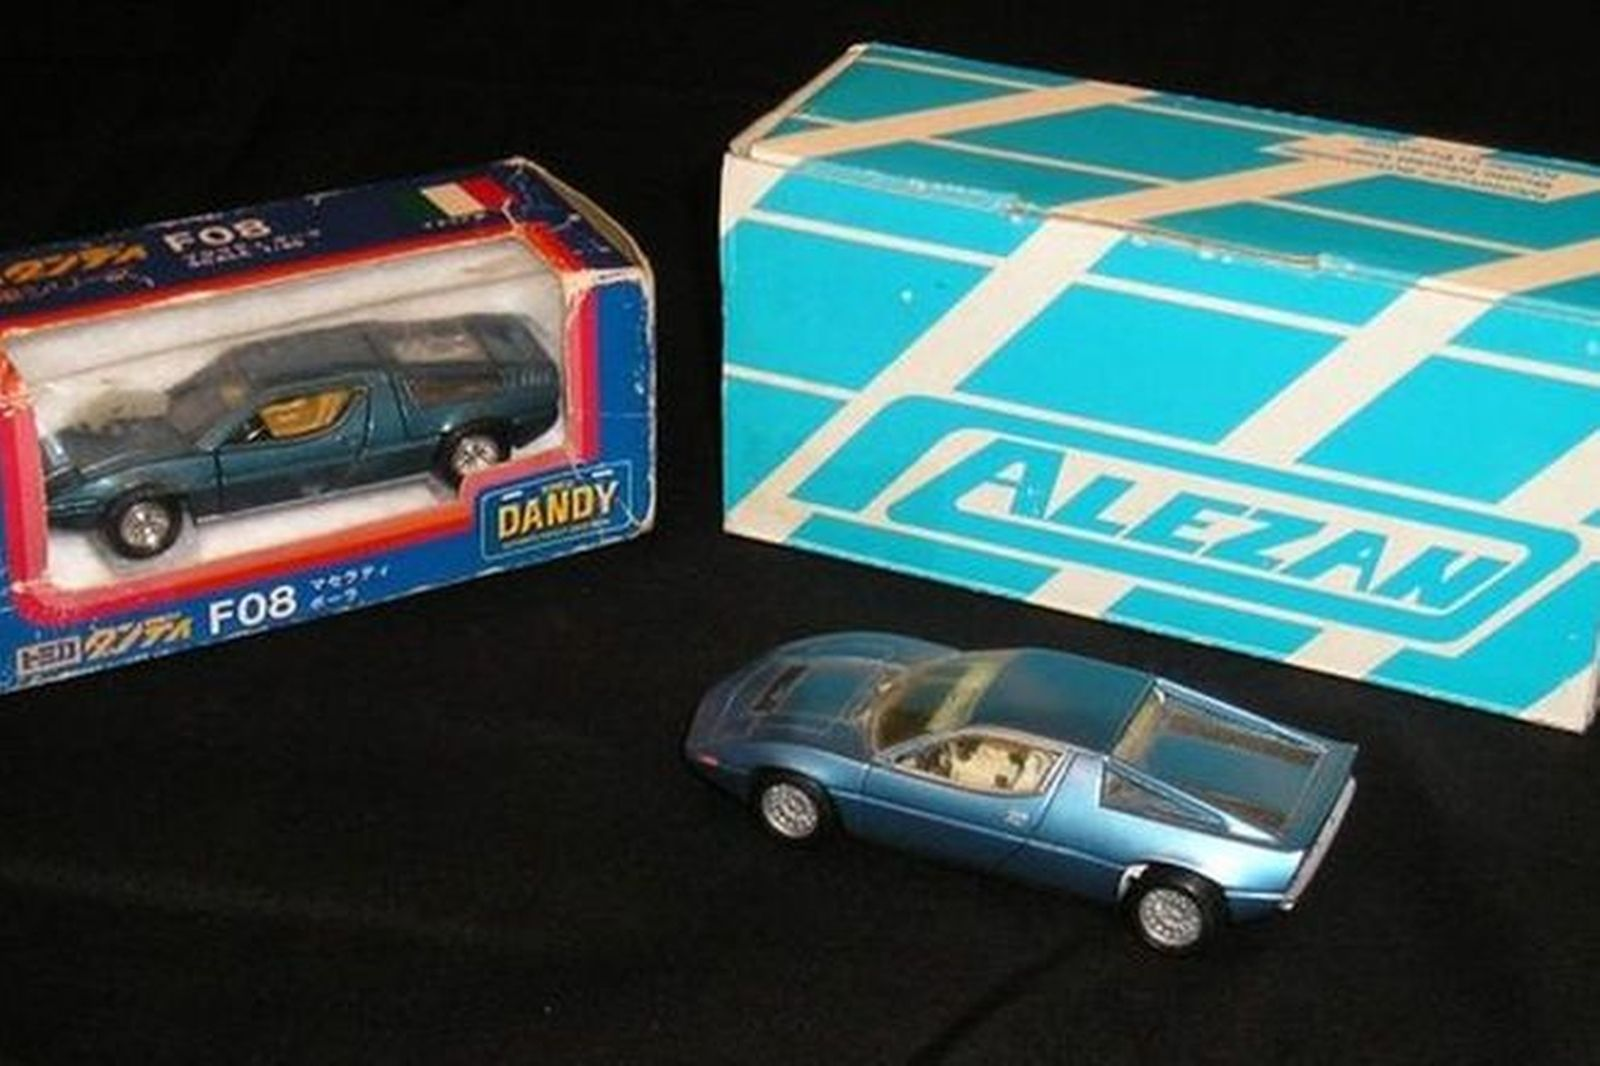 2 x Maserati Models (Merak SS by Alezan, Bora by Tomica Dandy)